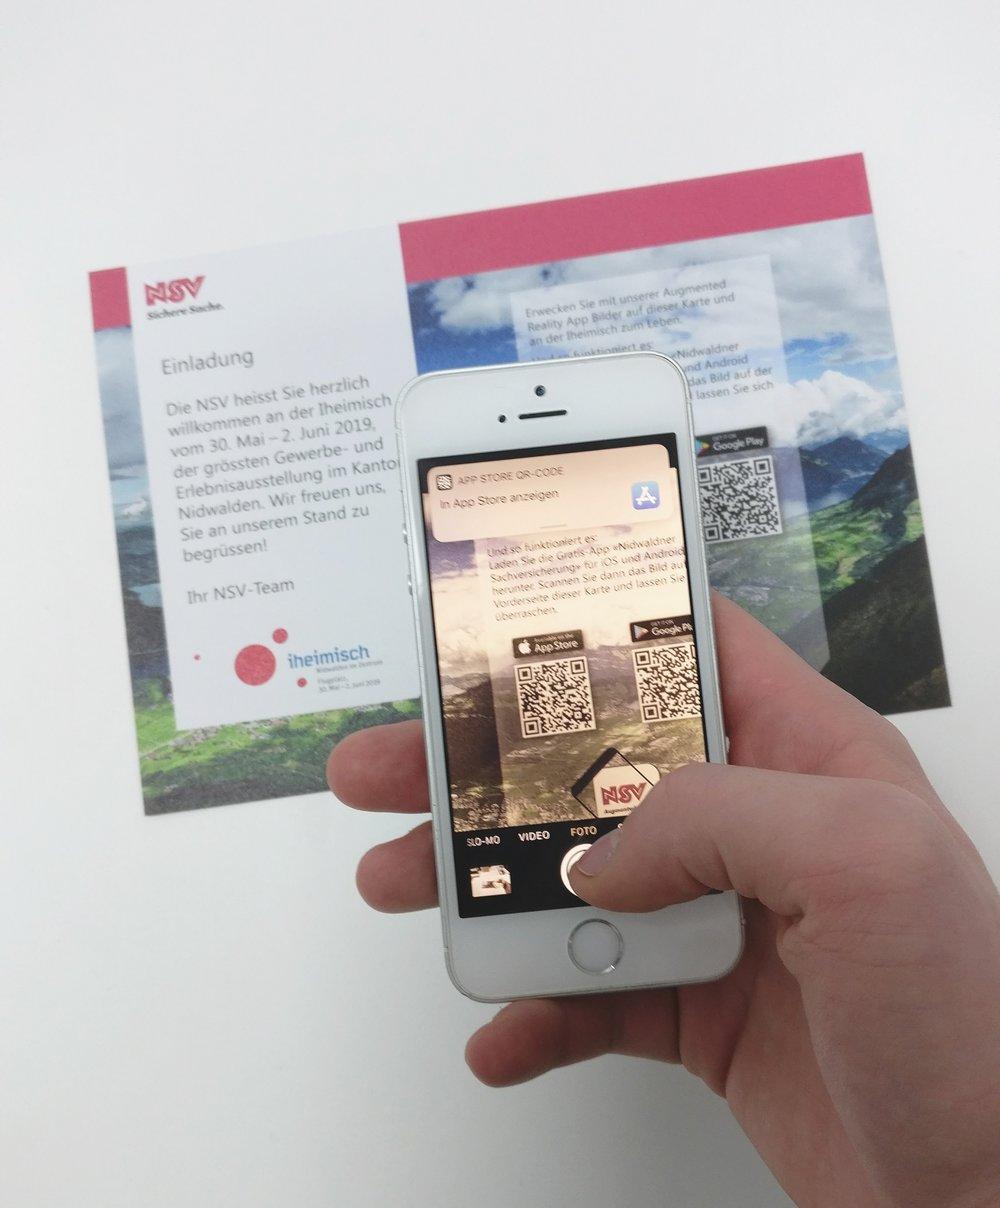 Nidwaldner Sachversicherung iheimisch 2019 PENGland AG Augmented Reality 2.jpg